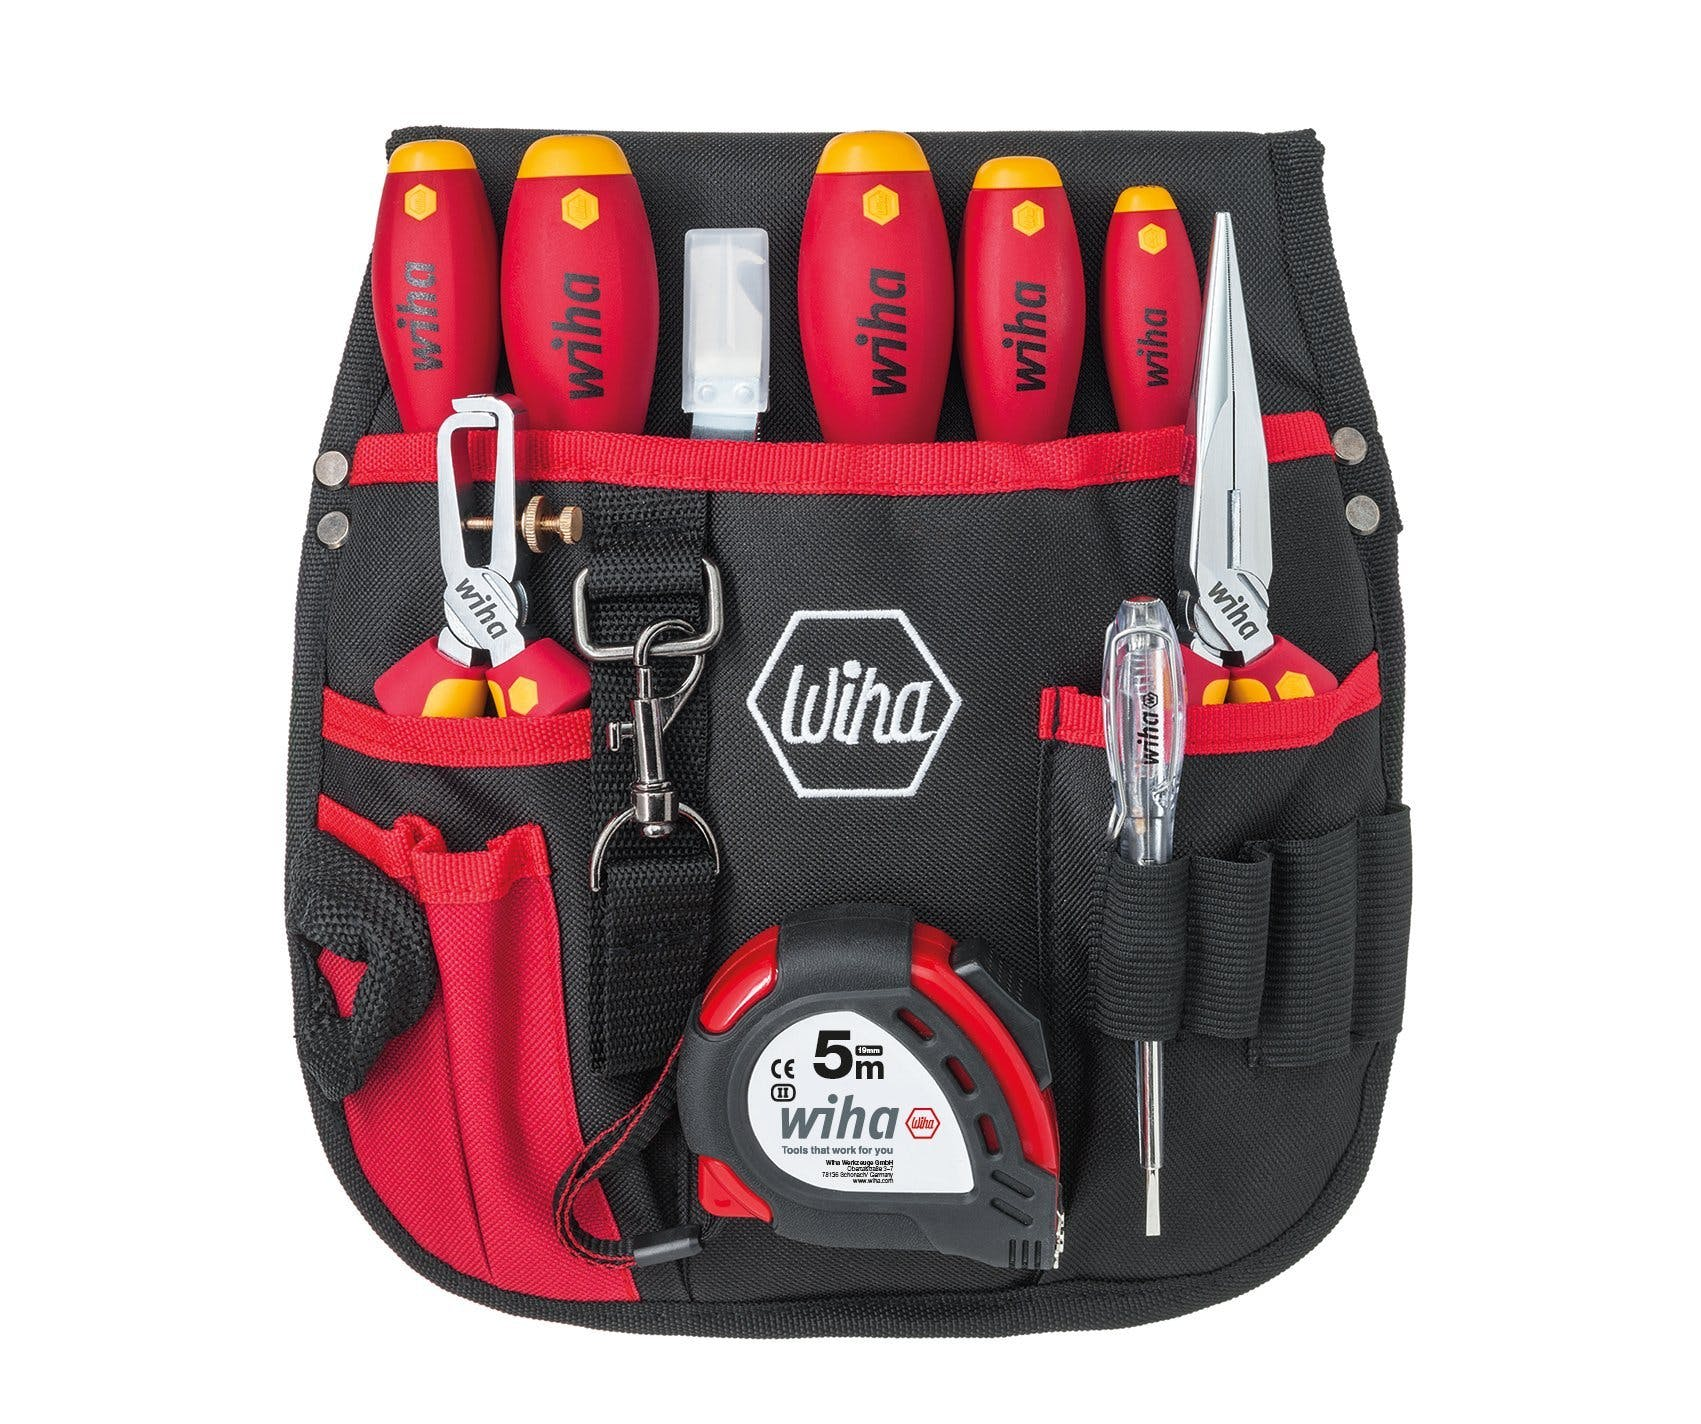 image of Wiha Electrician Tool Sets